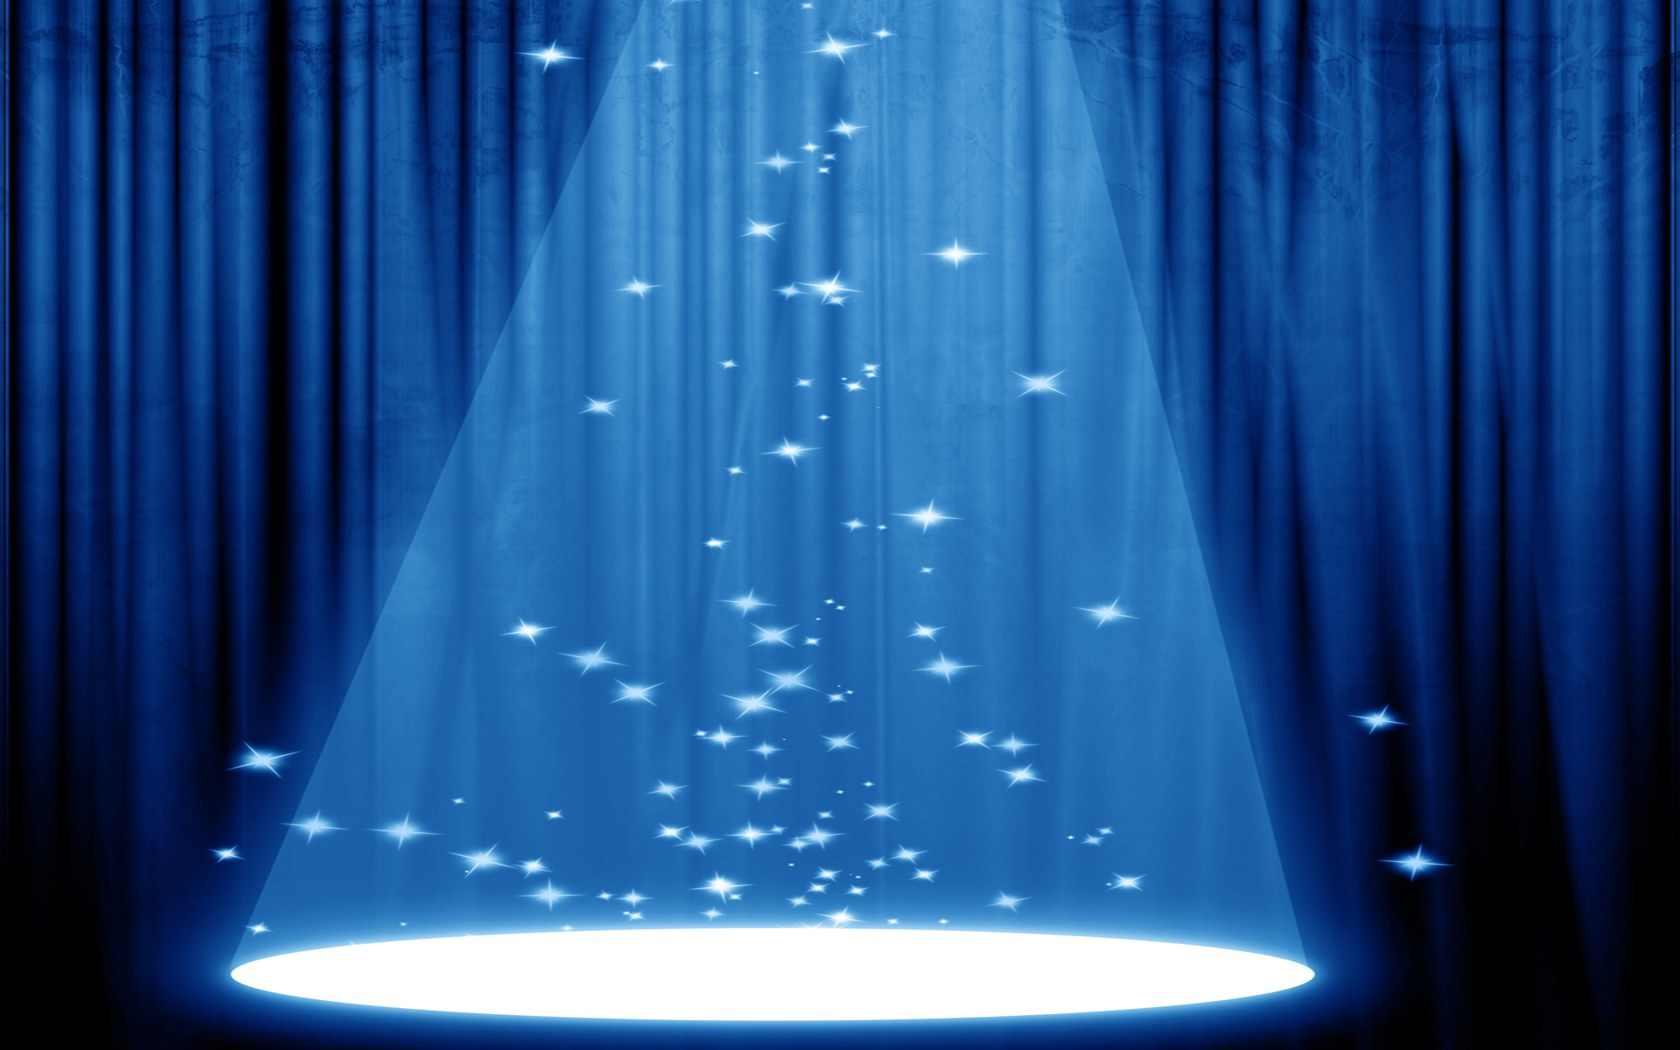 Stage curtains spotlight - Stage Curtains Spotlight 45